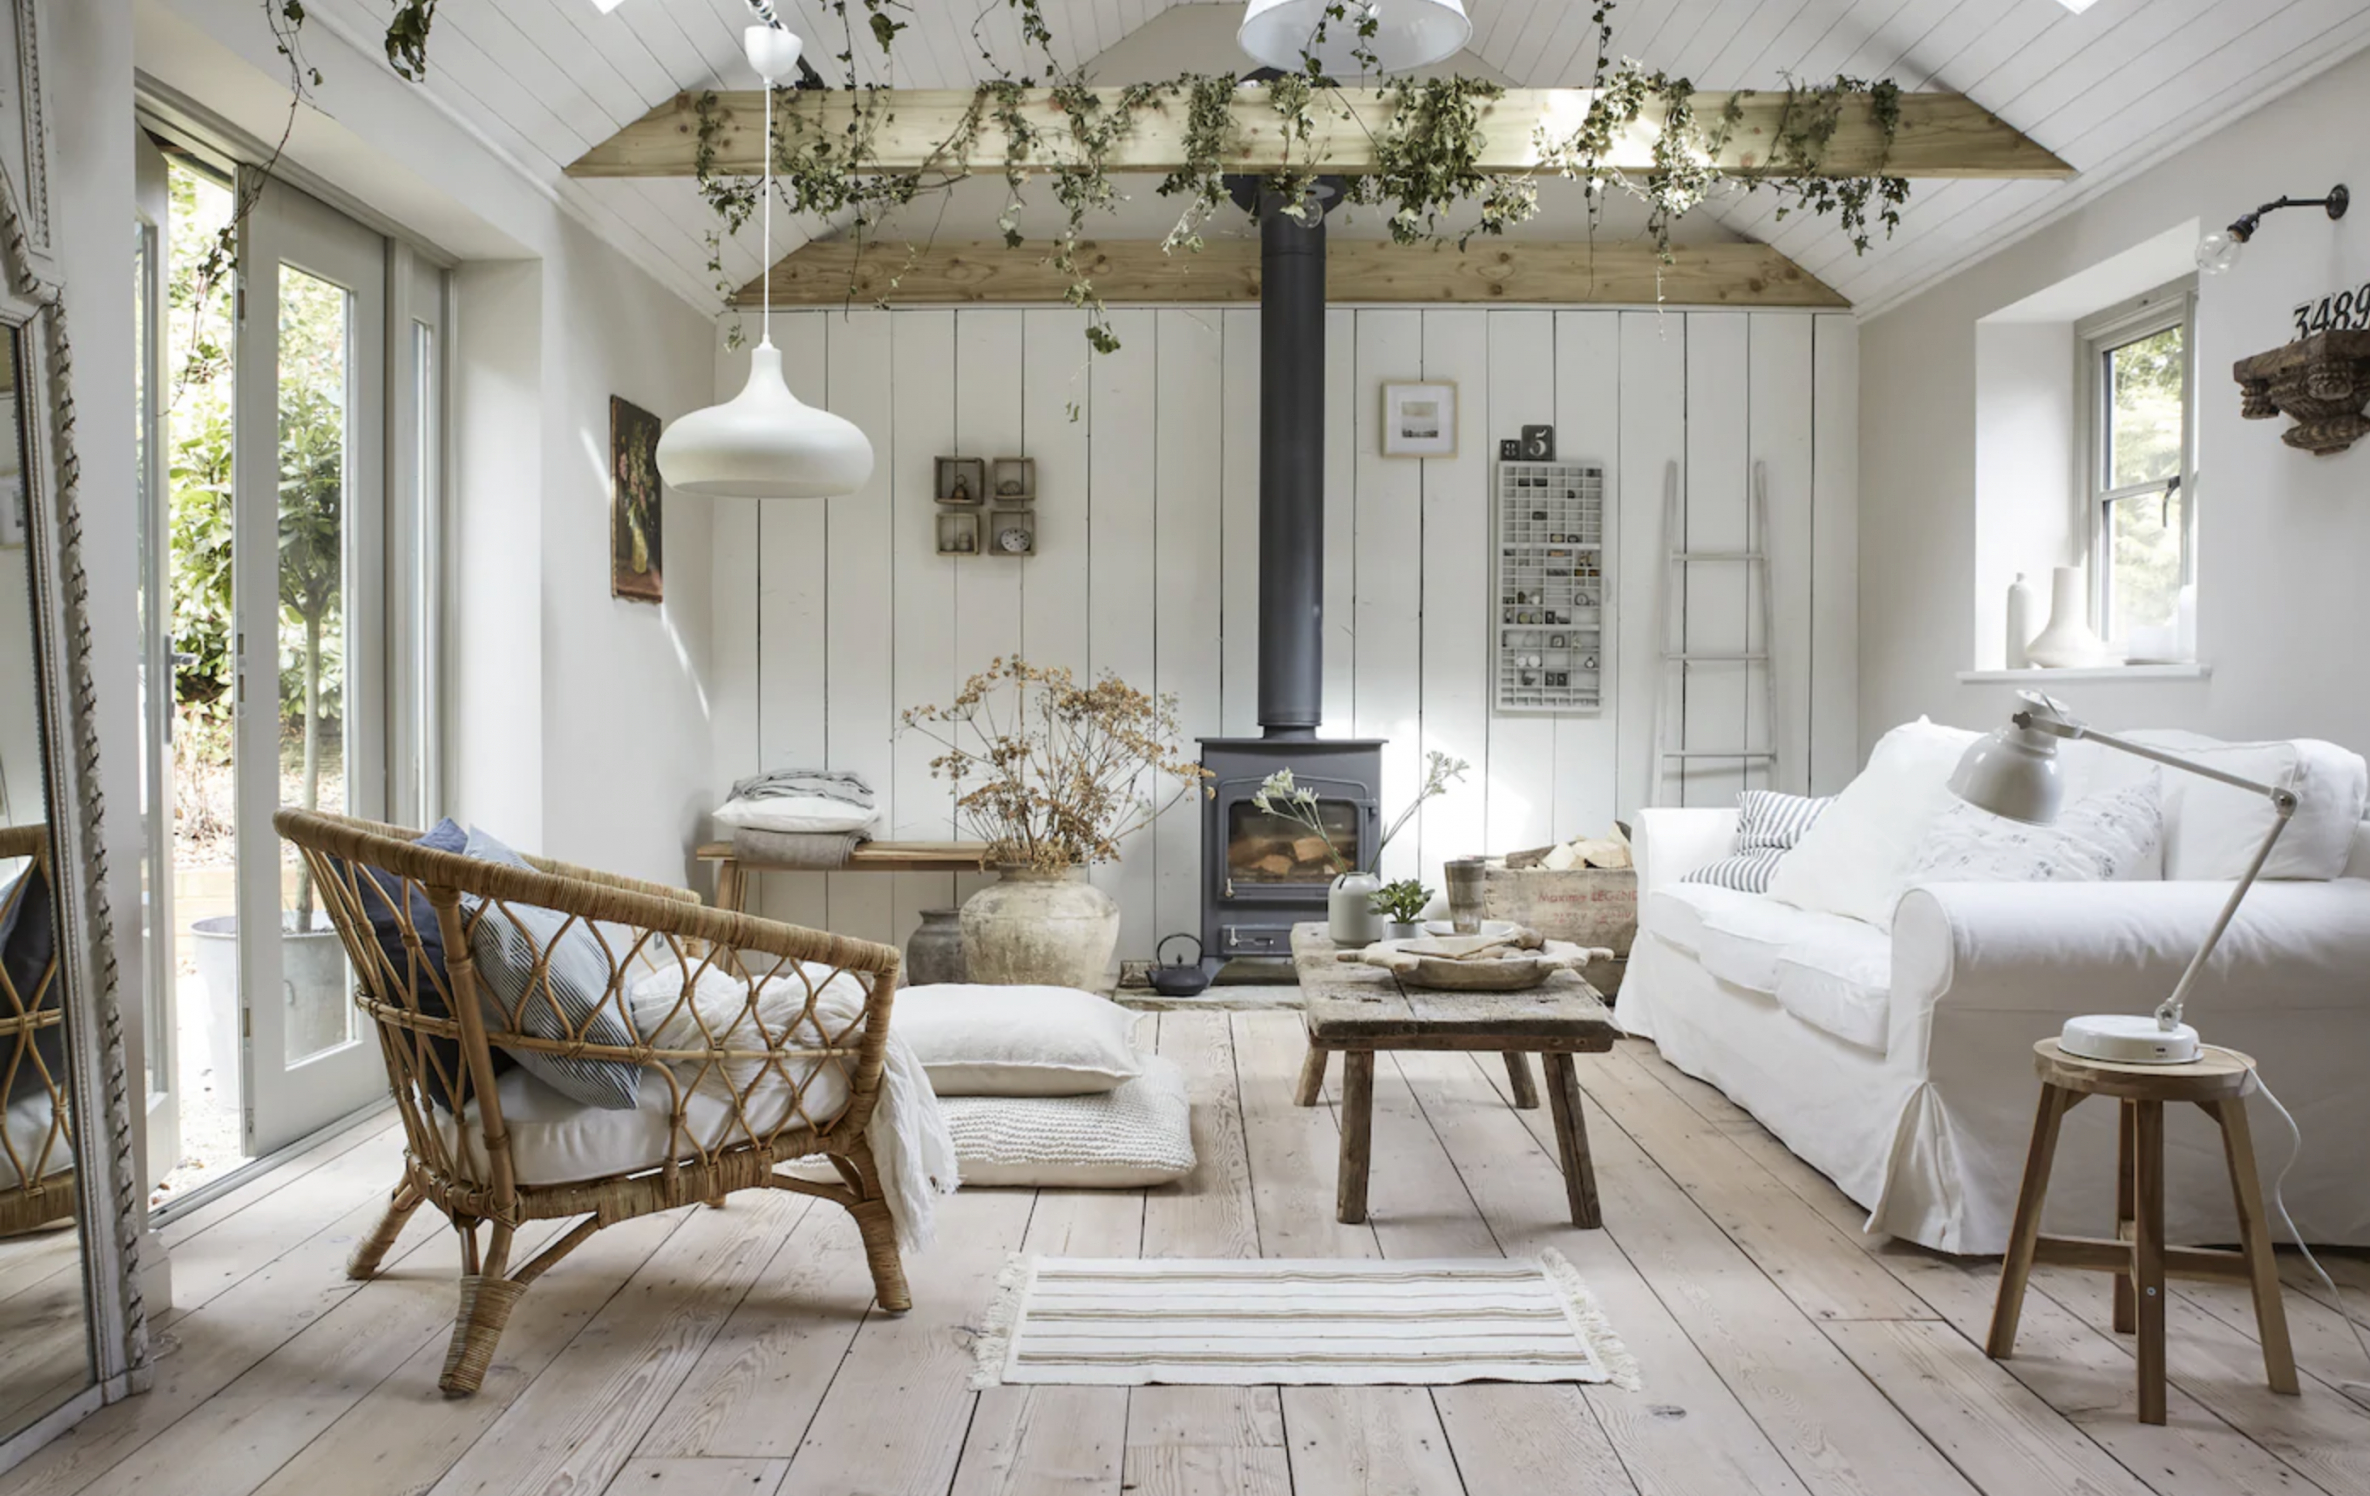 Living Room Lighting Ideas | Real Homes inside Lighting Ideas For Living Room